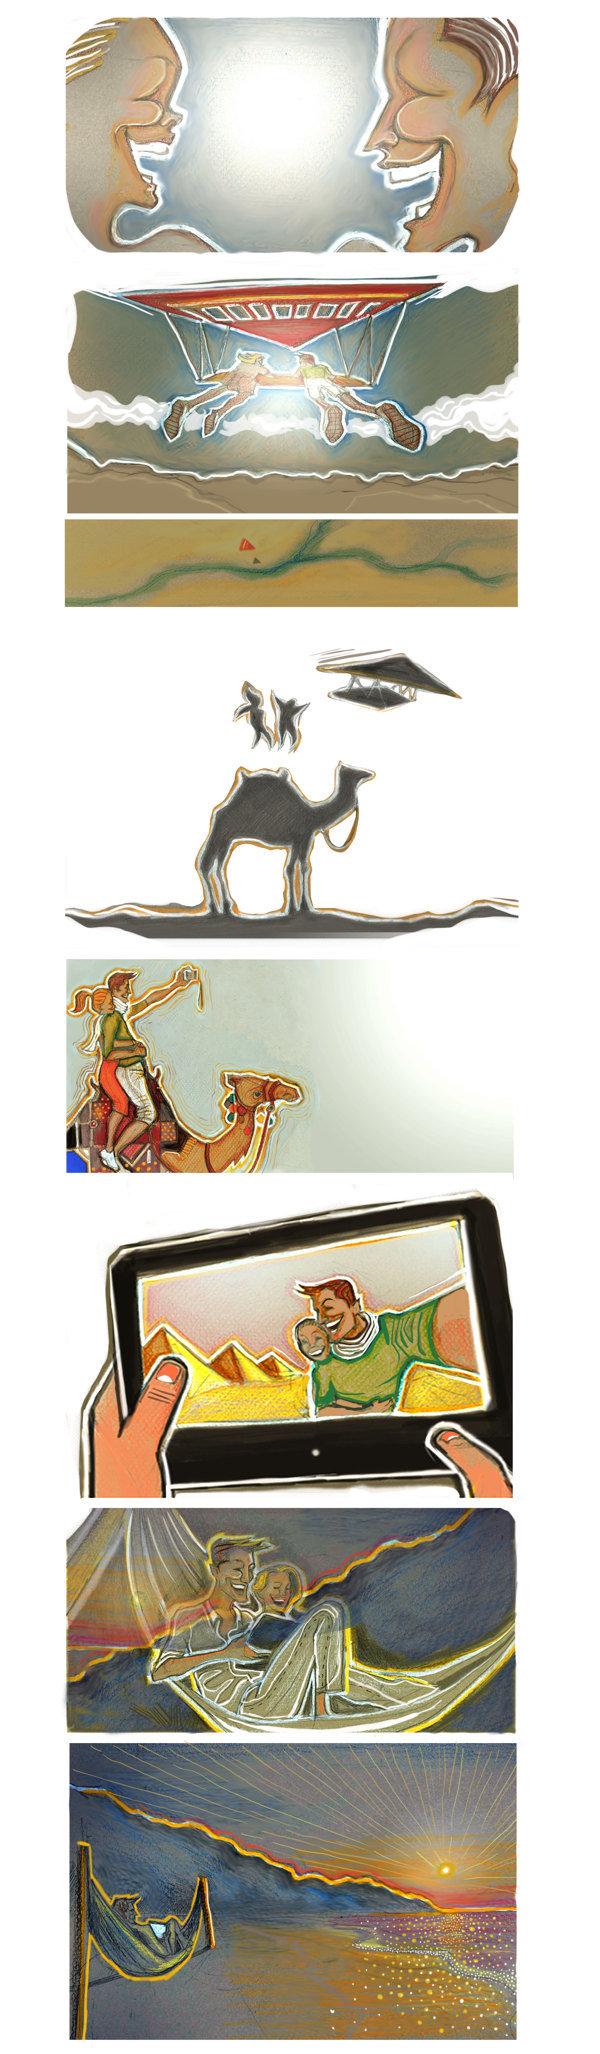 Egypt tourism storyboard/comics